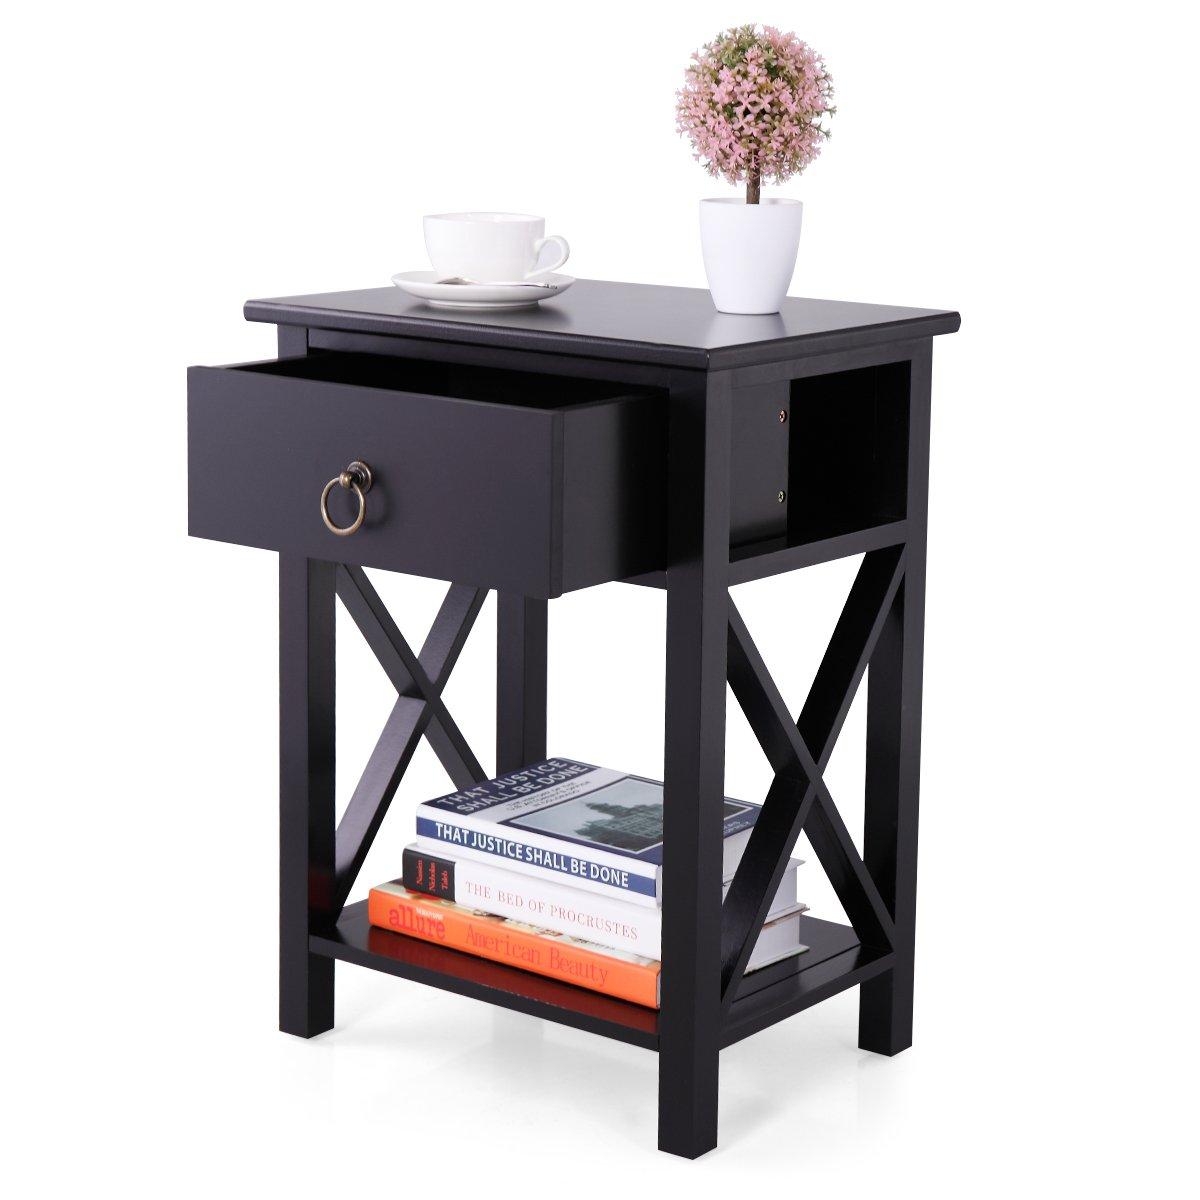 LAZYMOON Wood Nightstand Table X-Design Sofa End Side Table Storage Shelf w/ 1 Drawer, Black Finish